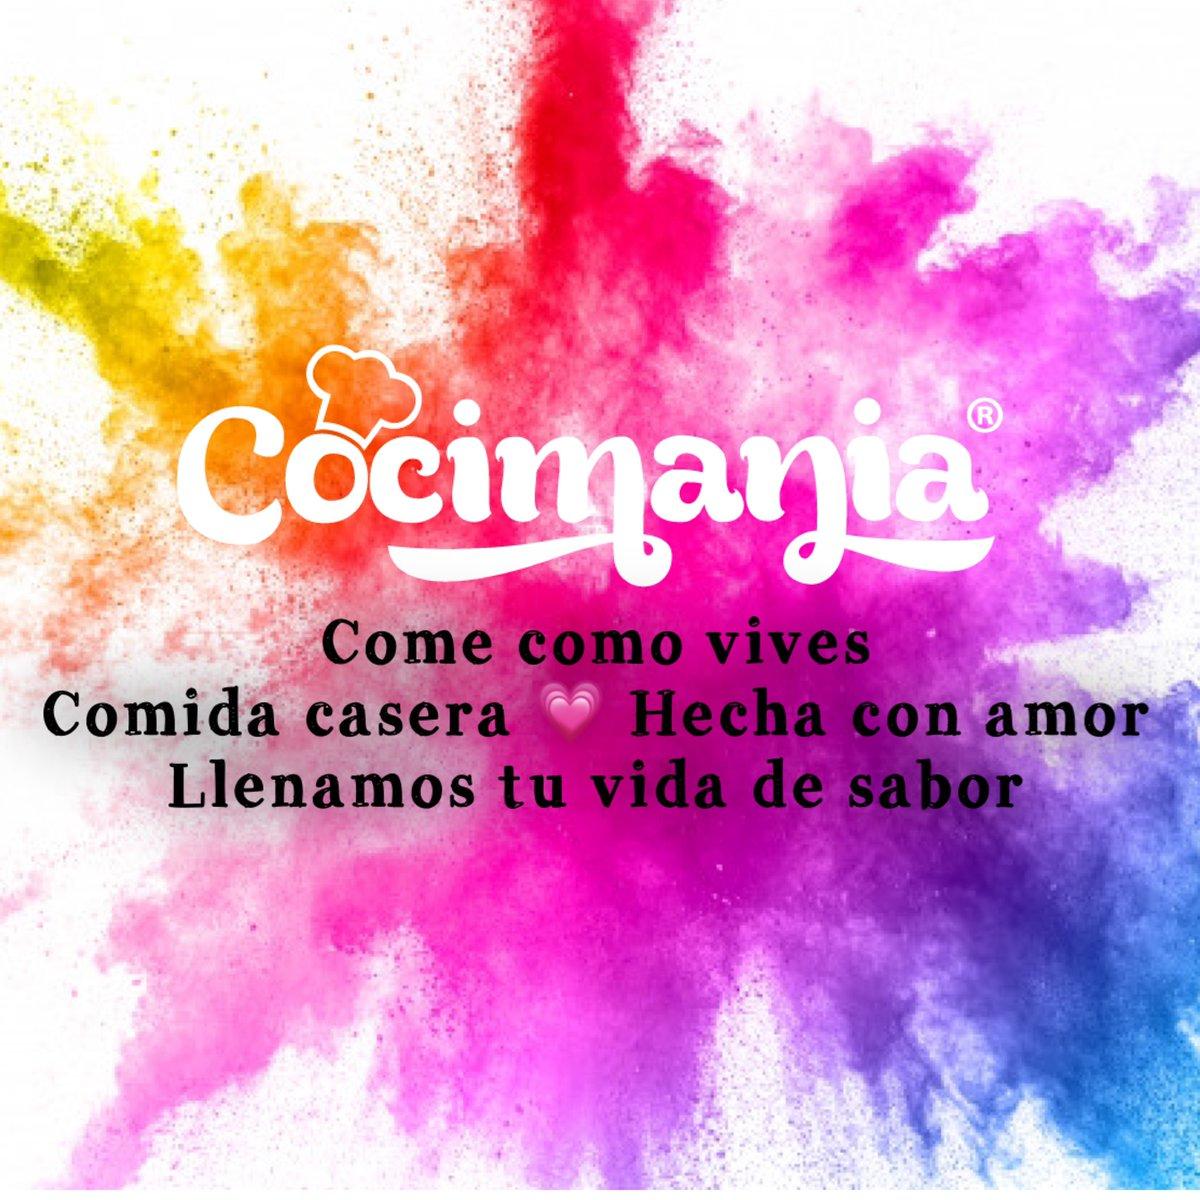 Made with Love 💗💗💗💗 😍 #SuperFanCocimania #yummy #flowers #lifestyle #hot #instafood #handmade #love #pink #blue #work #flowers #drawing #inspiration #holiday #nyc #london #instacool #BebeComoVives #ComeComoVives #bares #bar #hosteleria #restauracion #baresdepalma #foodpalma